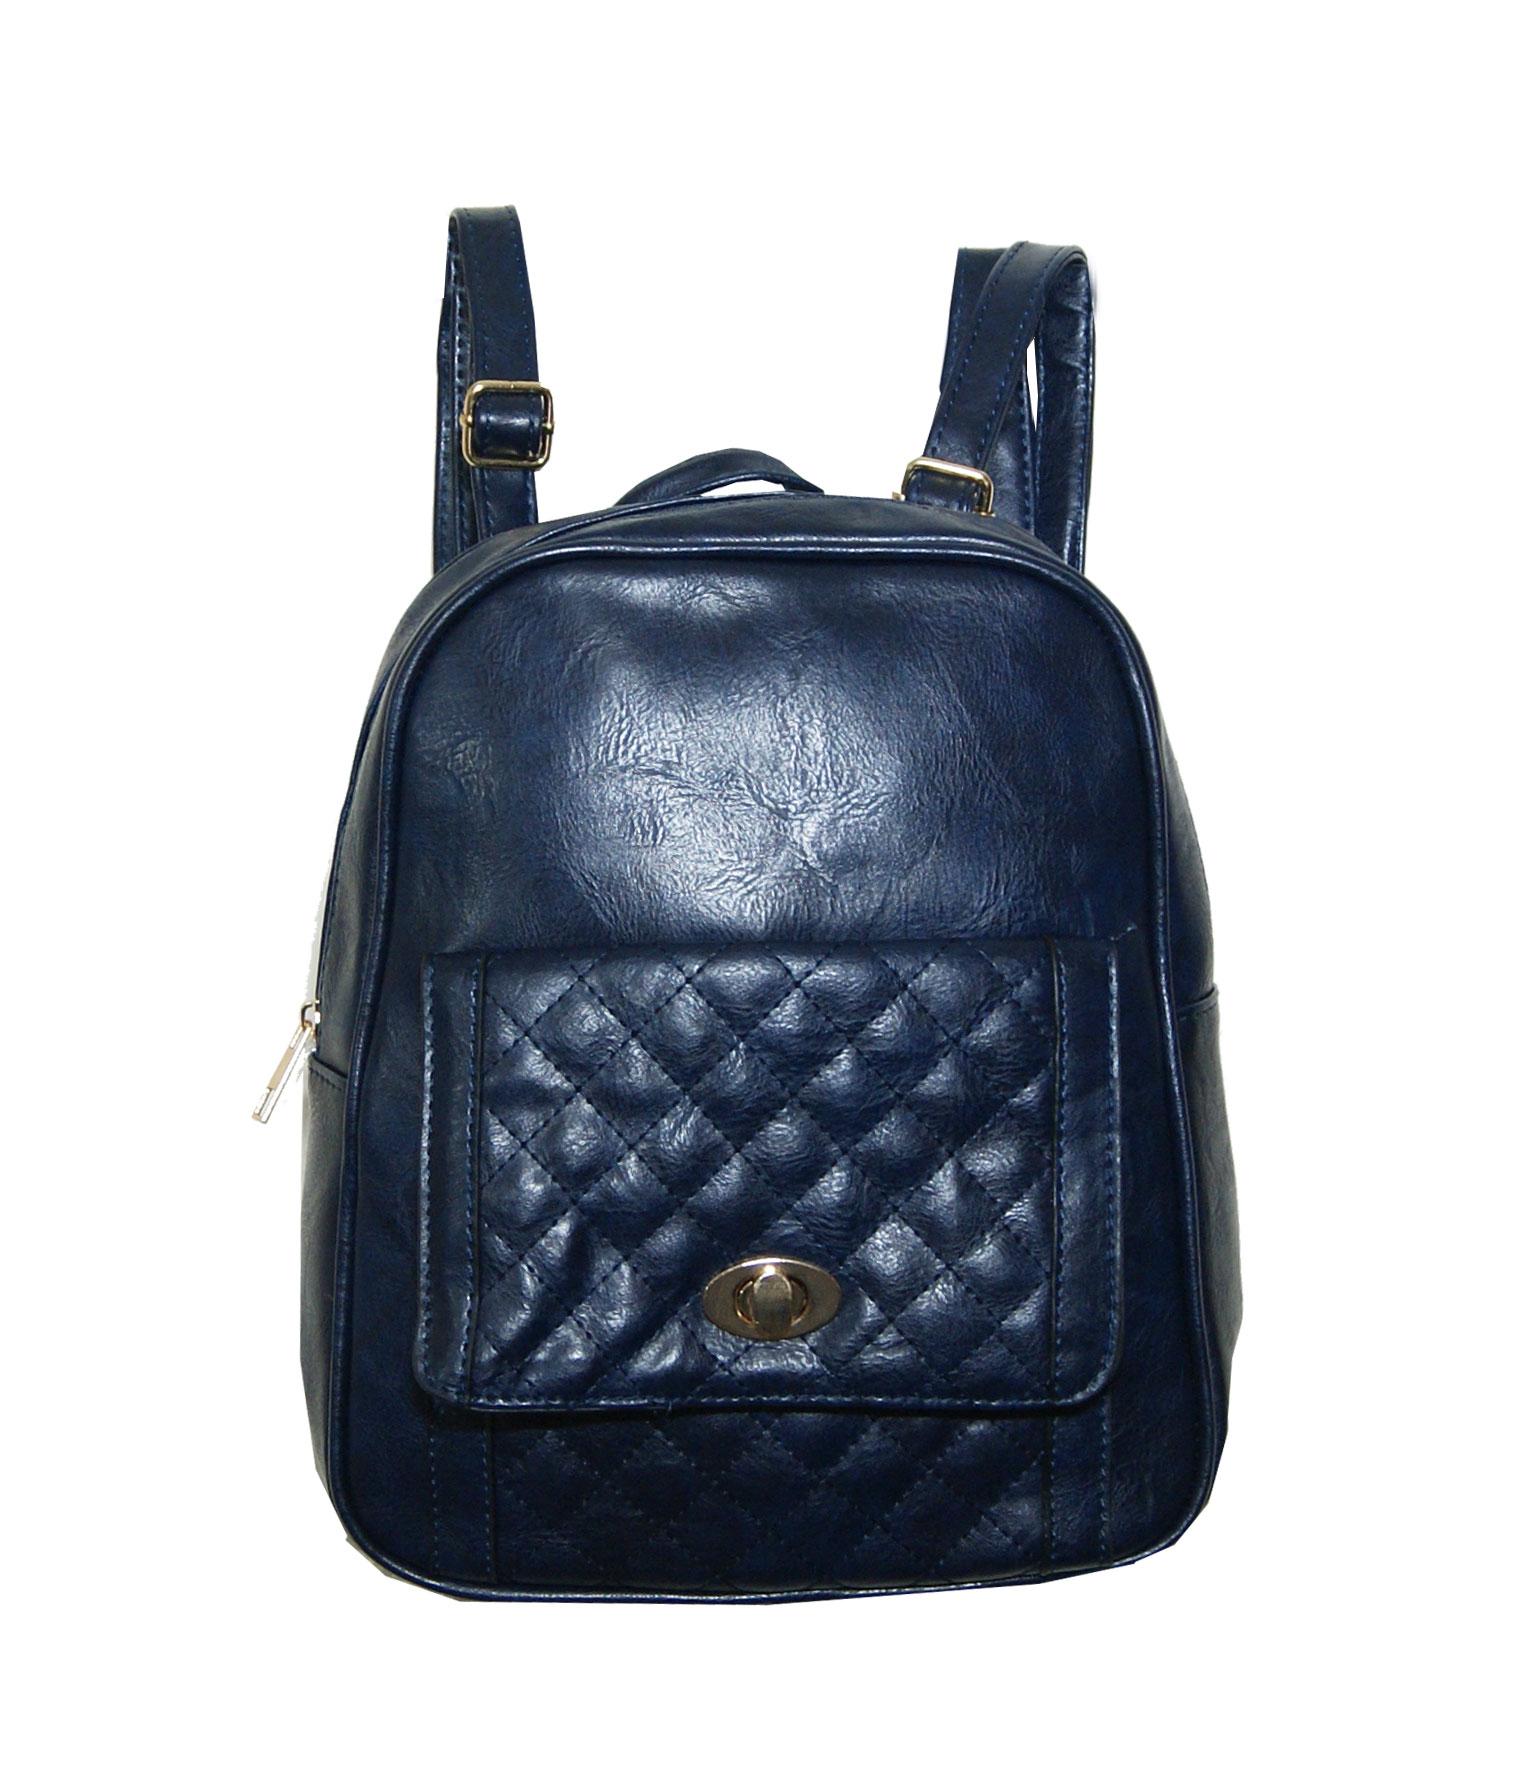 Backpack No 333 - Navy Μπλε (Silvio 333)